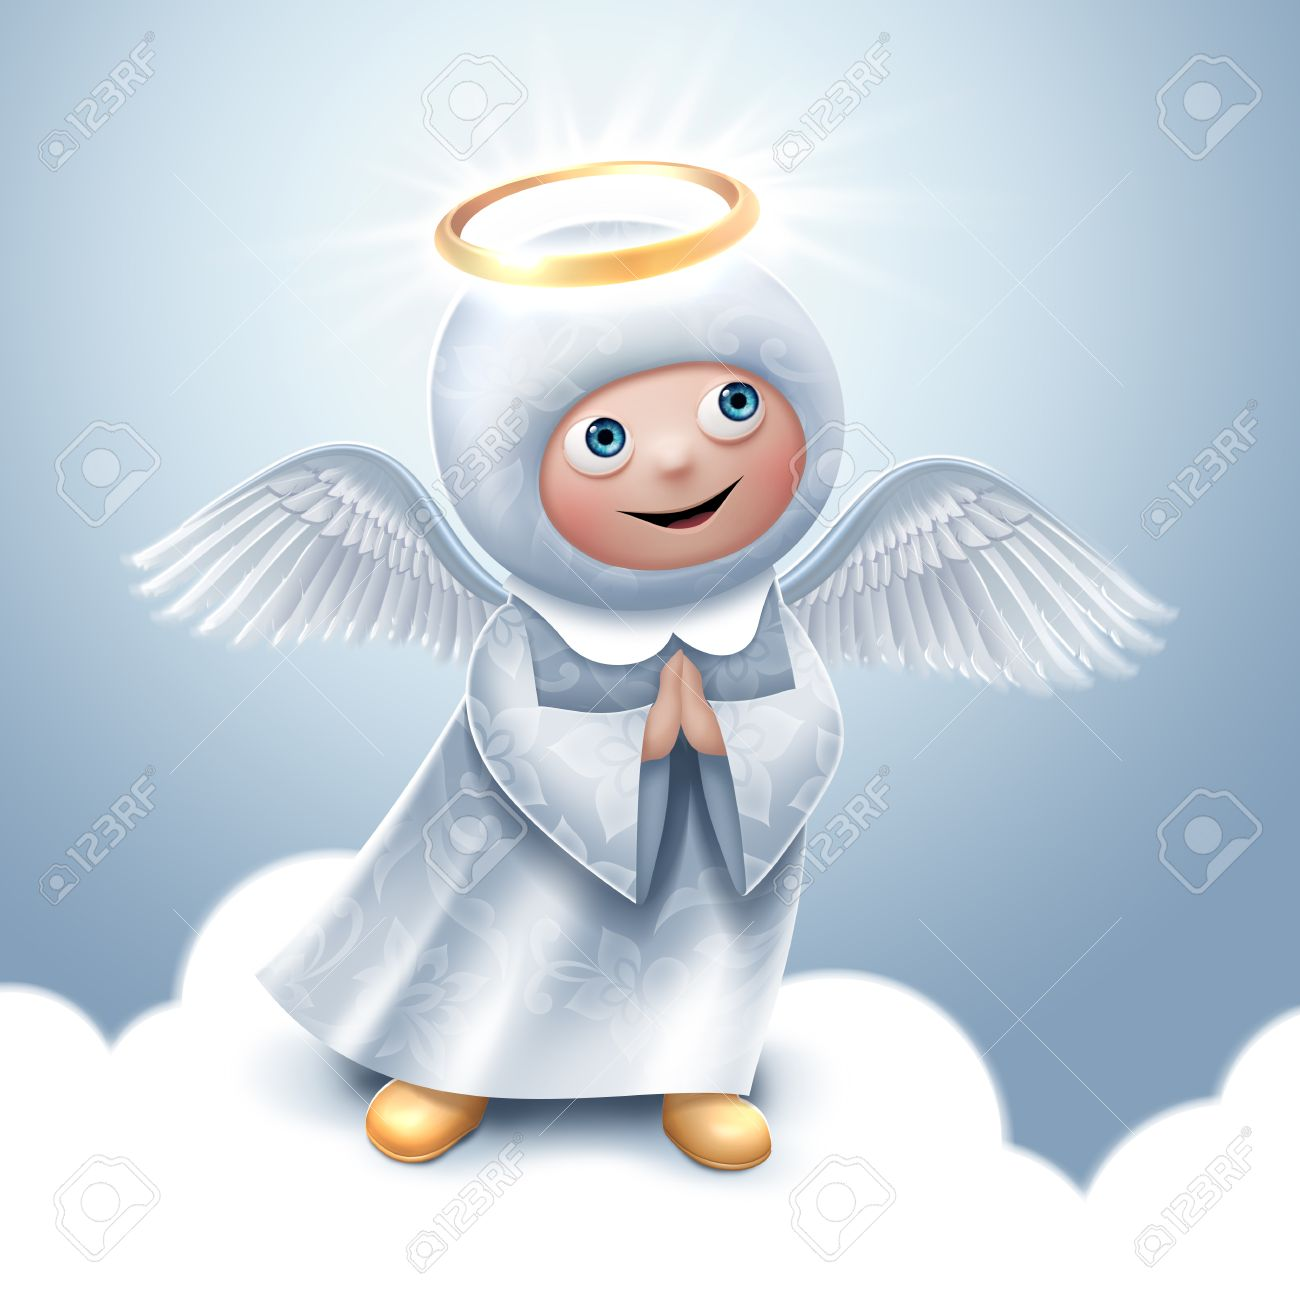 Praying Angel Clip-art, Christmas Greeting Card Stock Photo ...